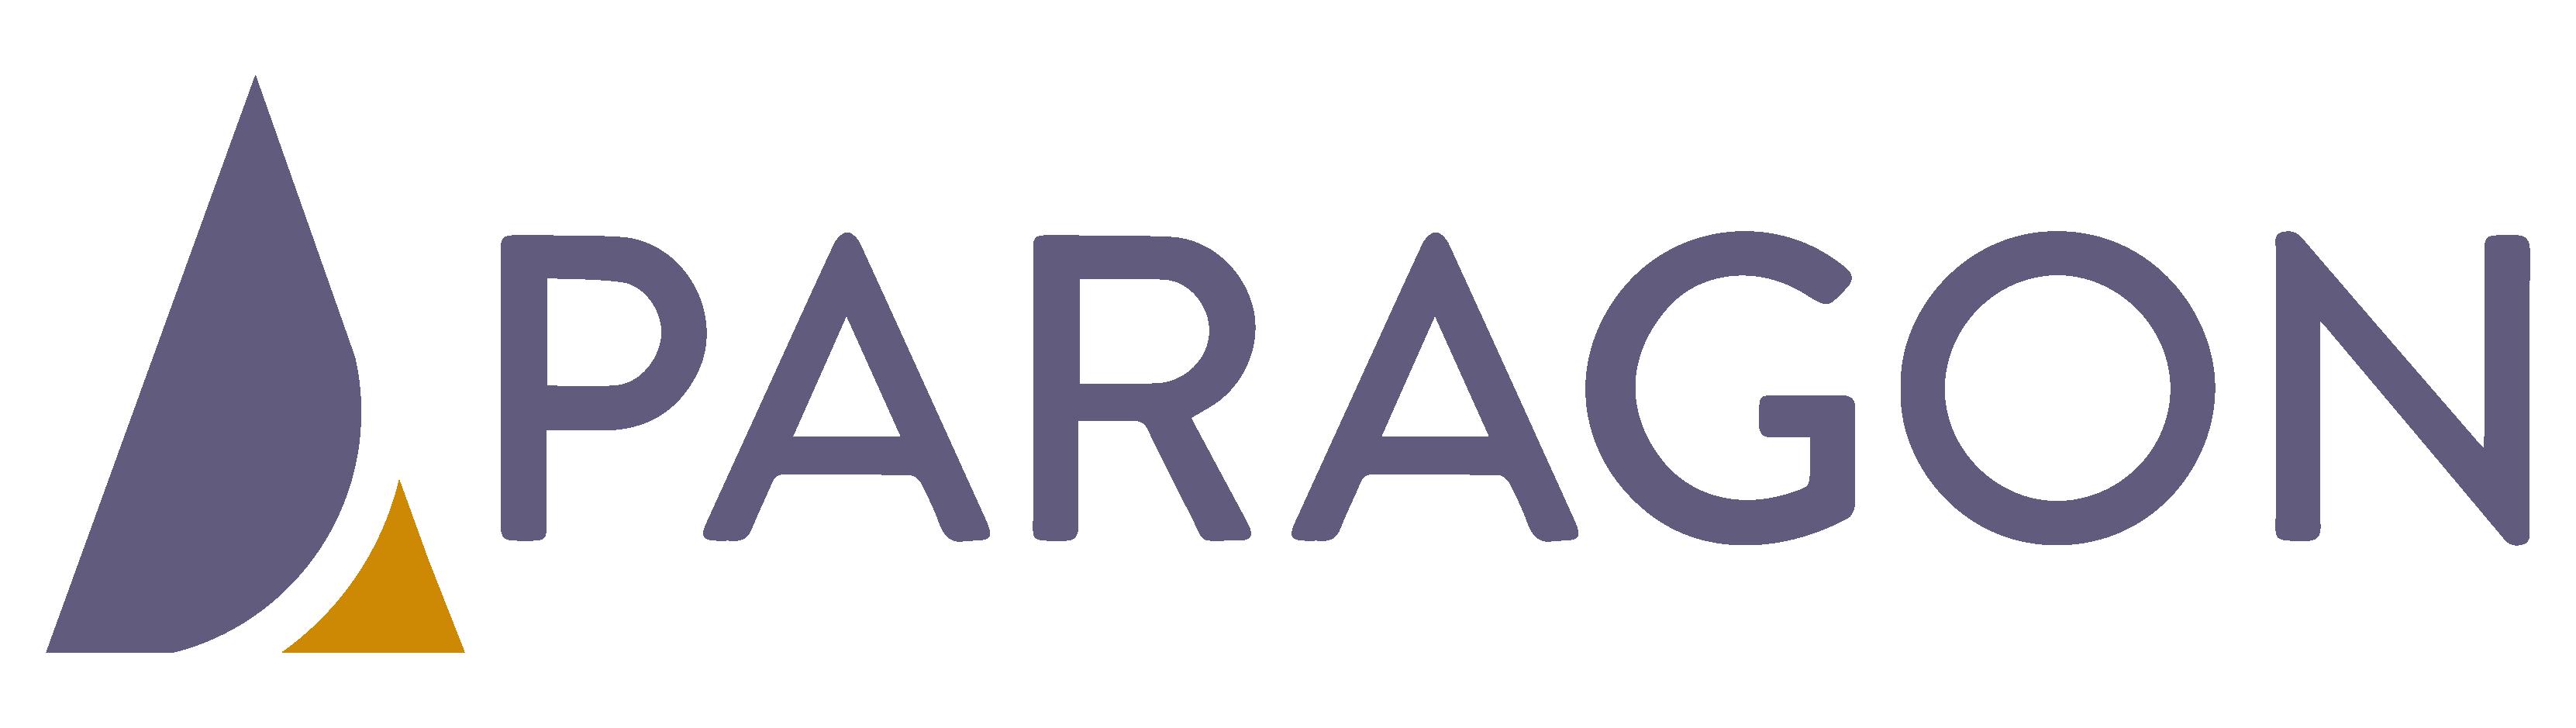 Paragon Store Fixtures